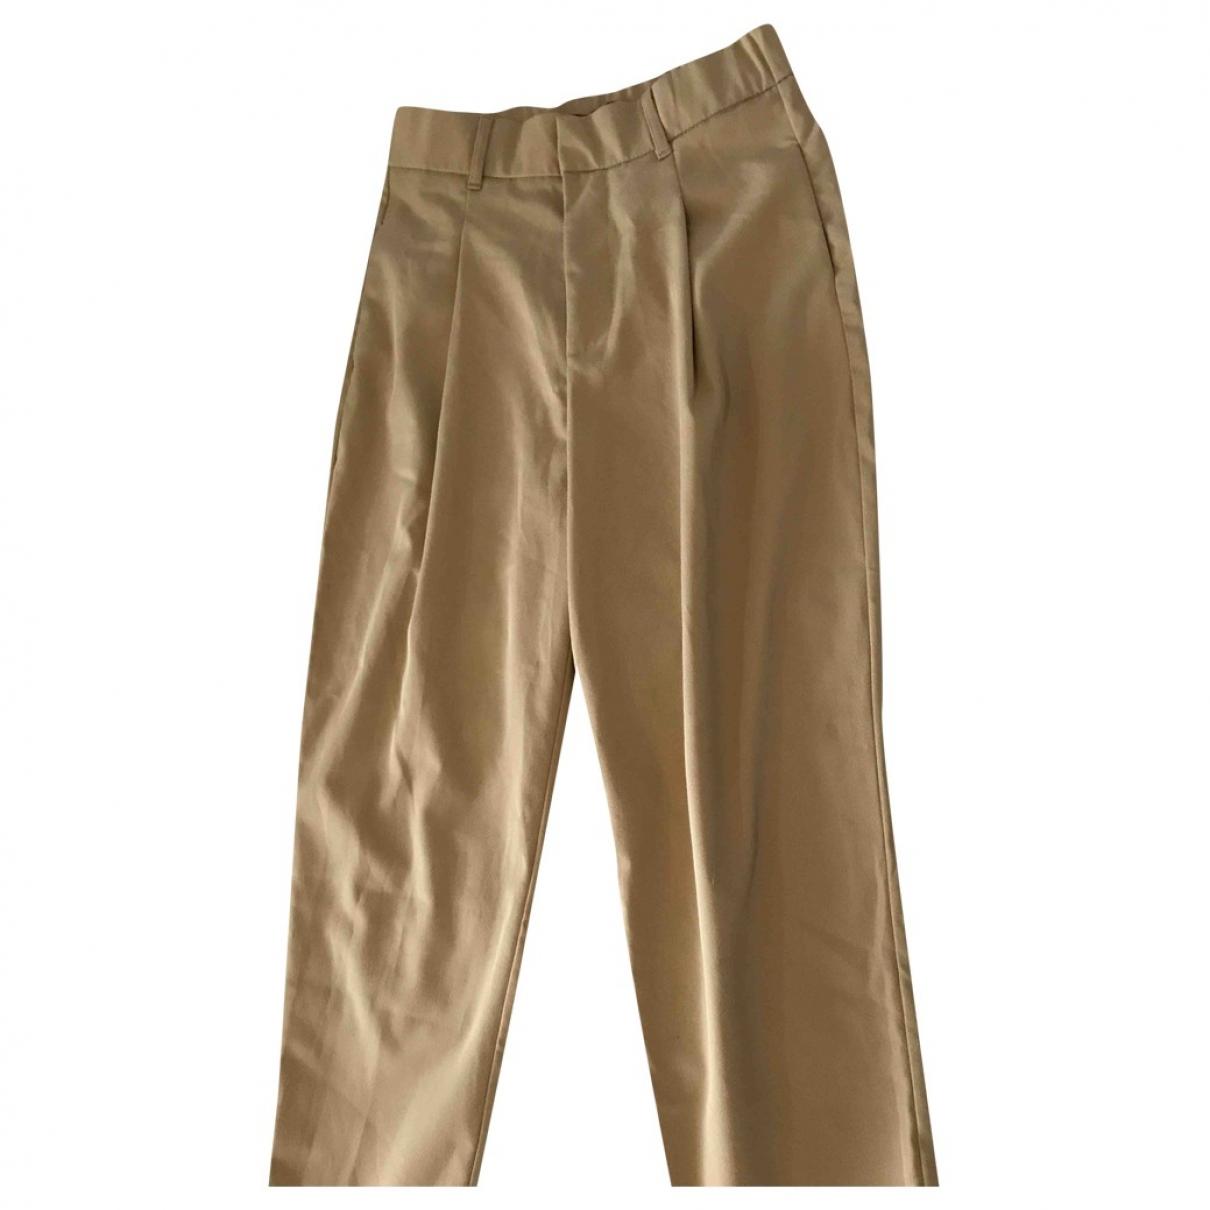 Zara \N Camel Trousers for Women M International